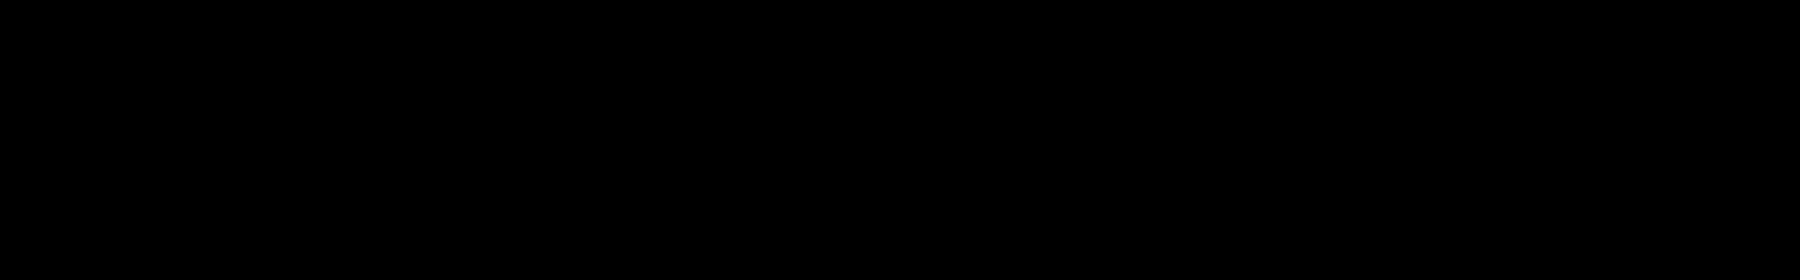 Synth Disco 2 audio waveform